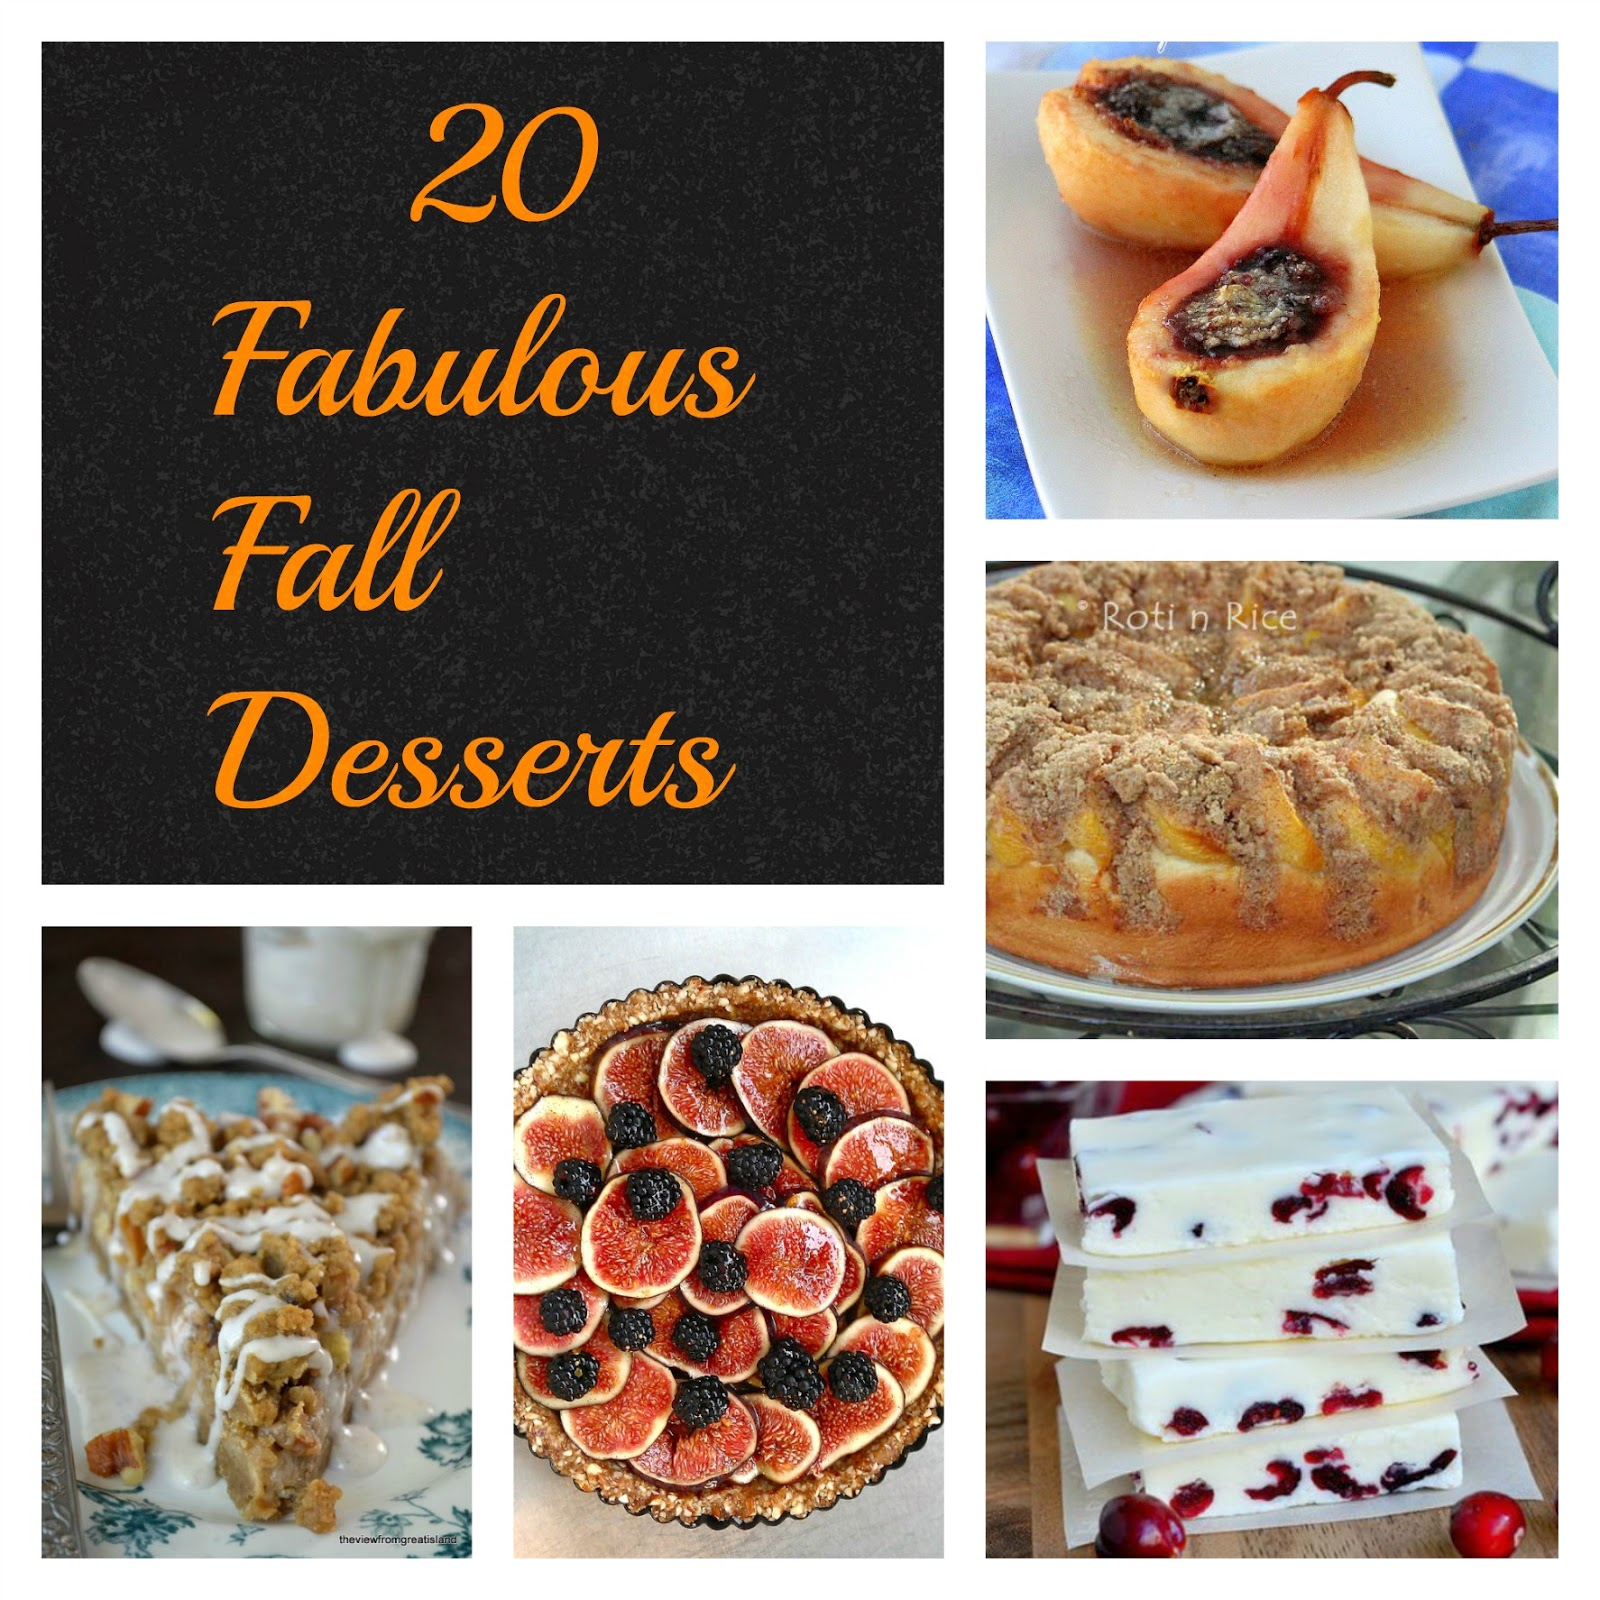 20 Fabulous Fall Desserts  Manila Spoon